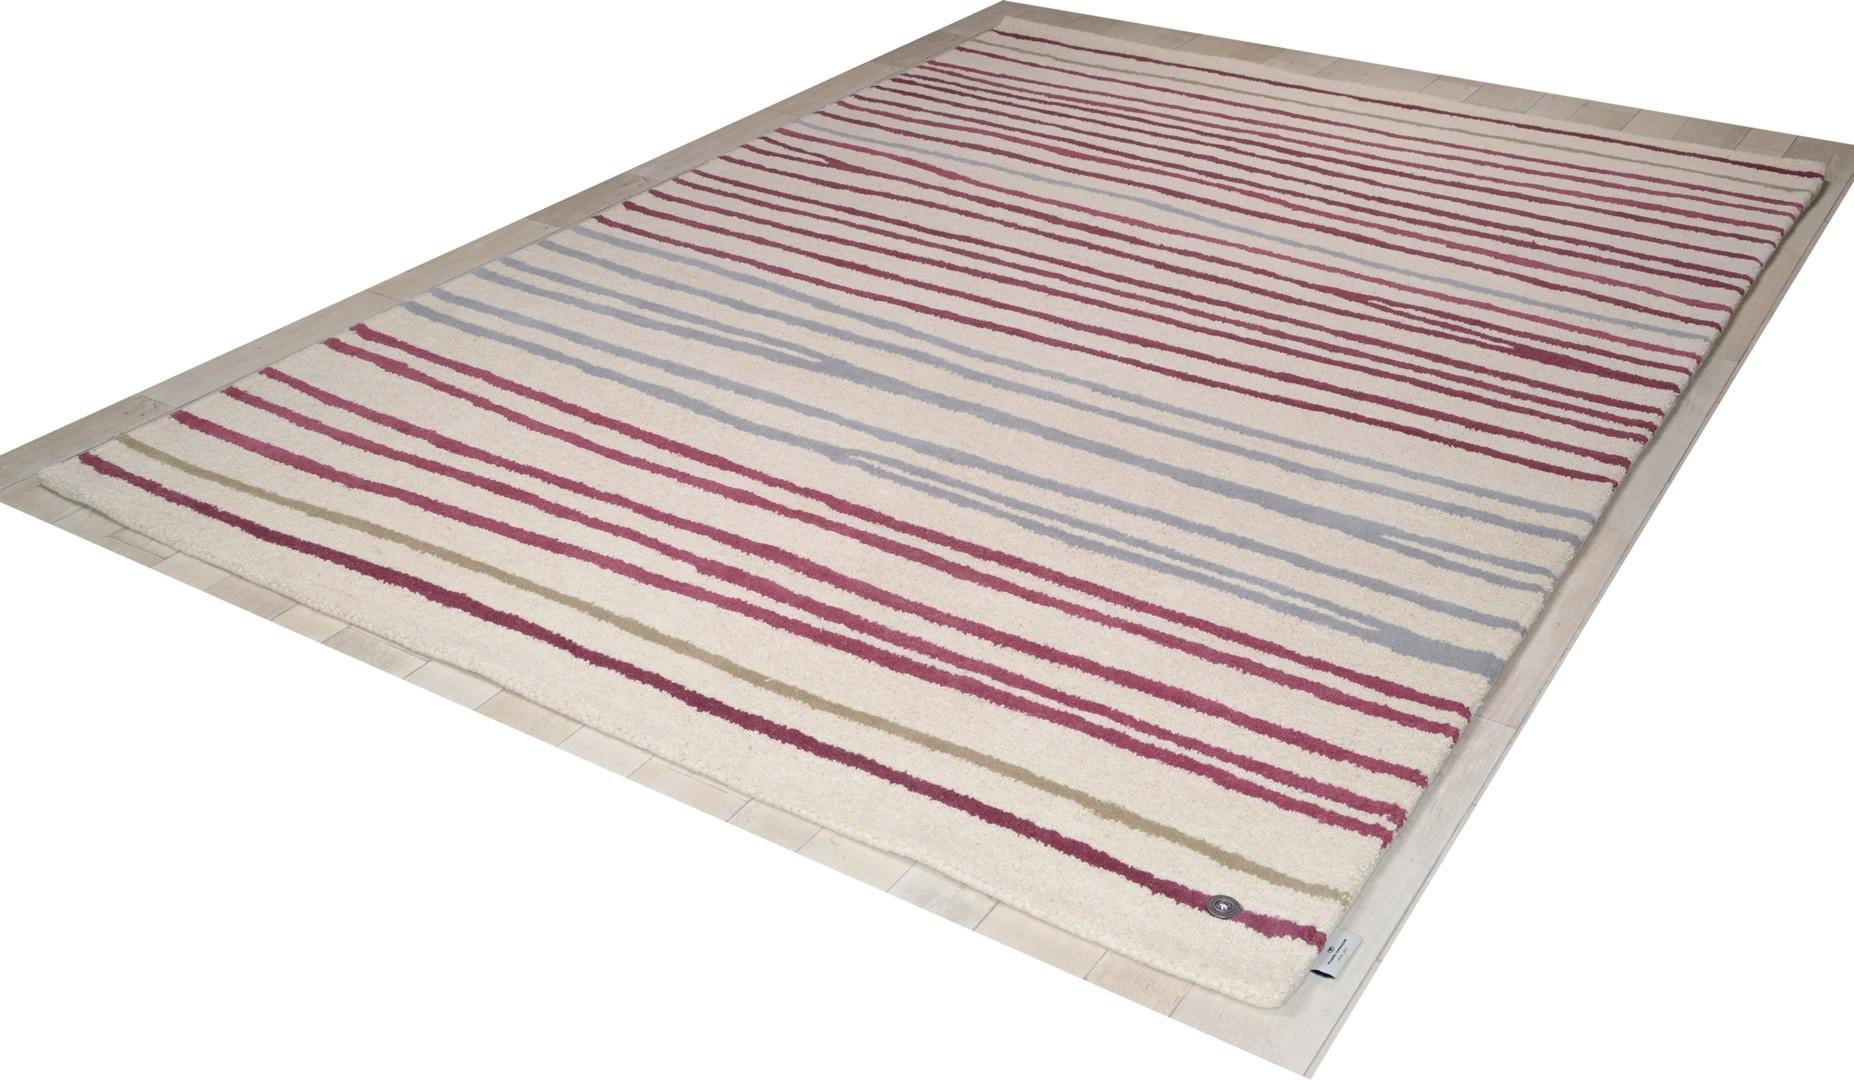 Tapis en laine Easy Stripes par Tom Tailor